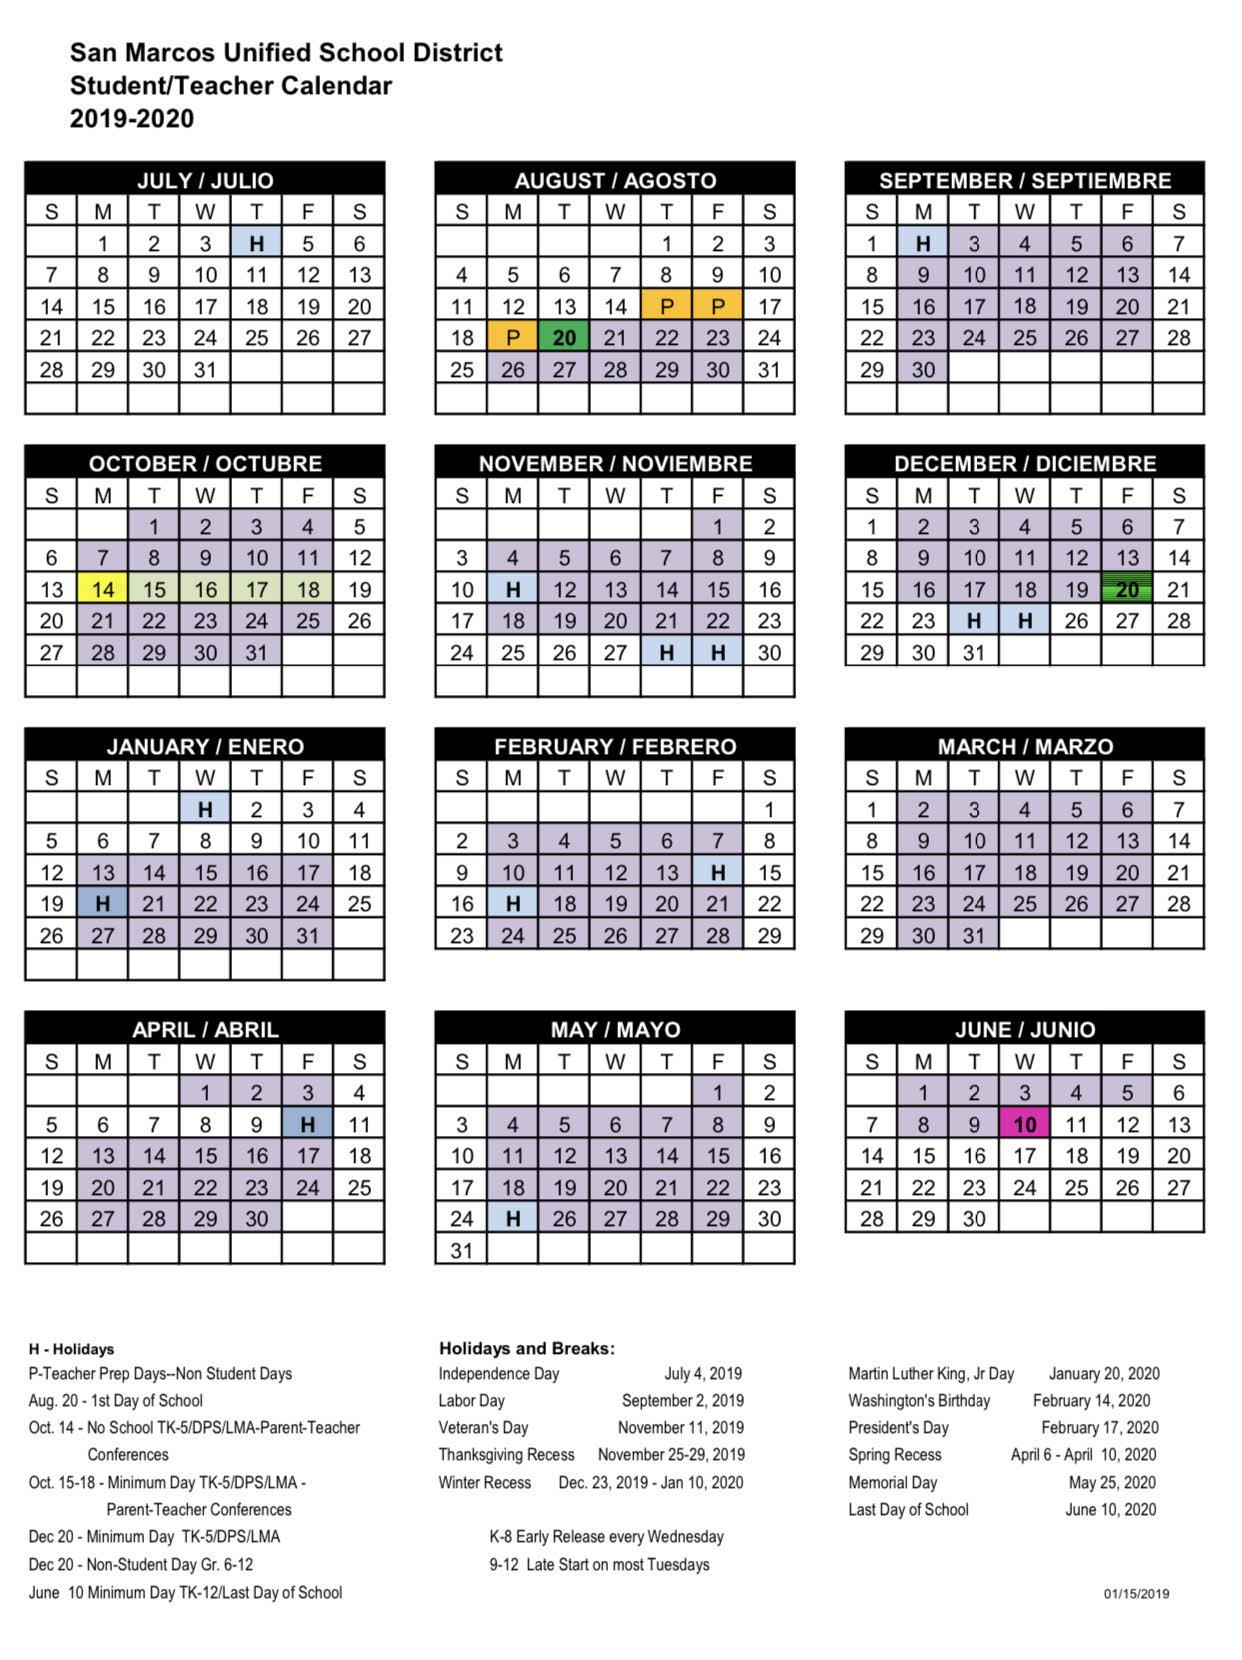 Calendar - San Marcos Unified